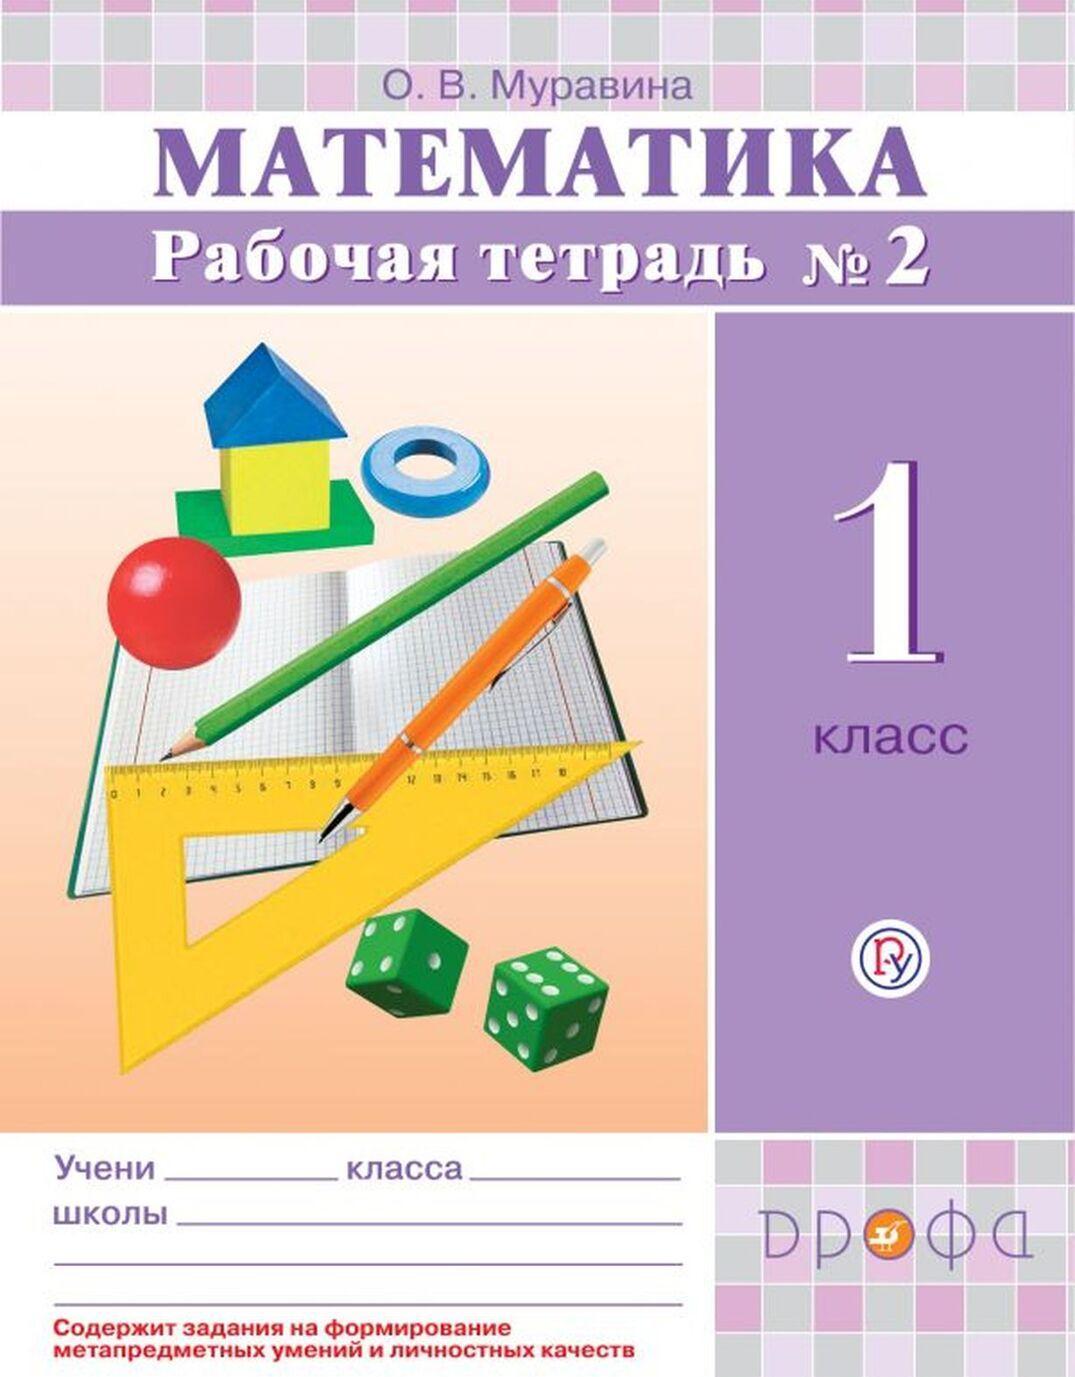 Matematika. 1 klass. Rabochaja tetrad № 2